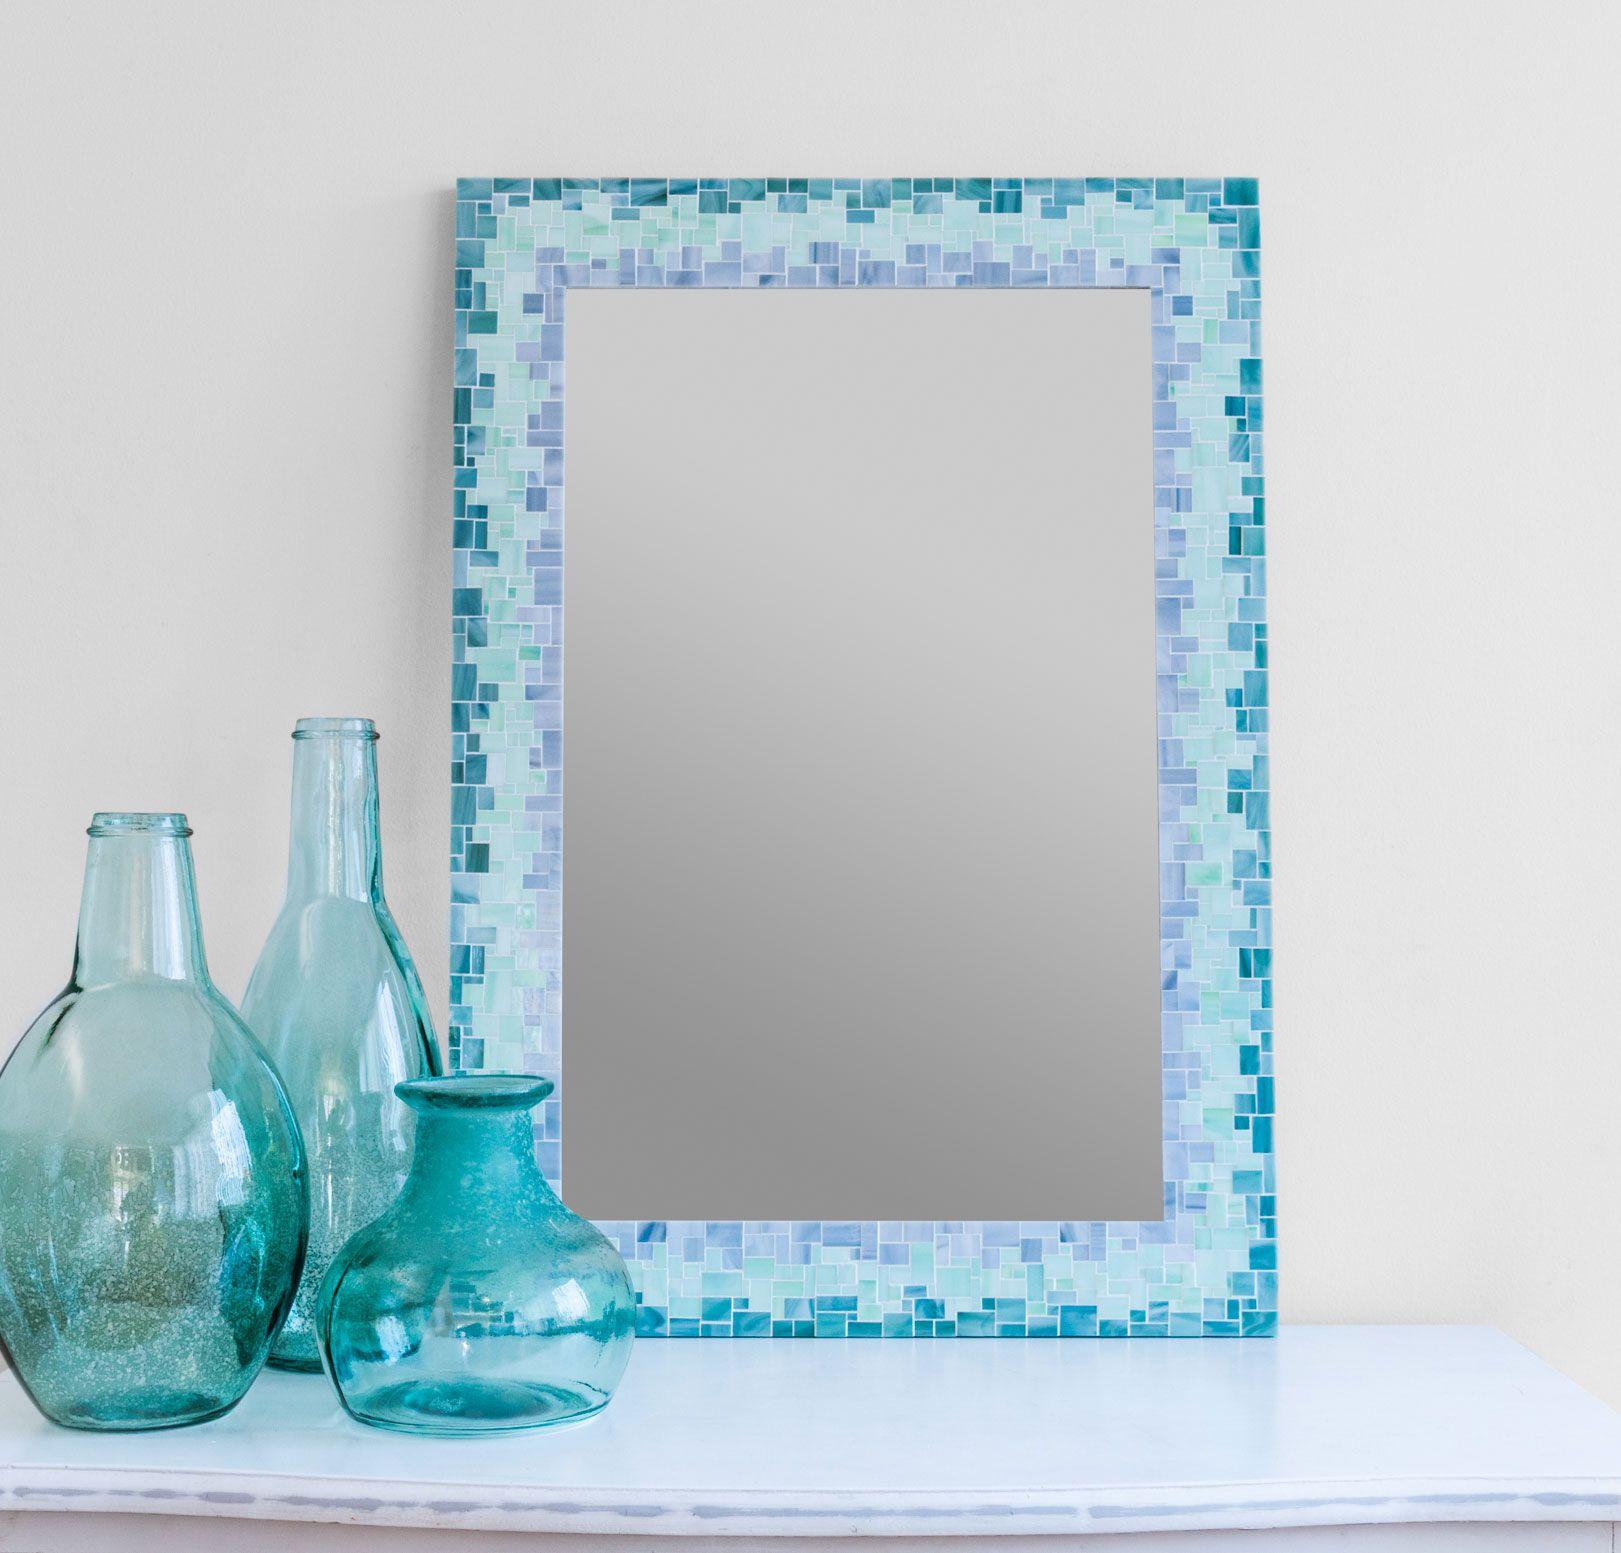 Mosaic Bathroom Mirror For Beach House Decor By Live In